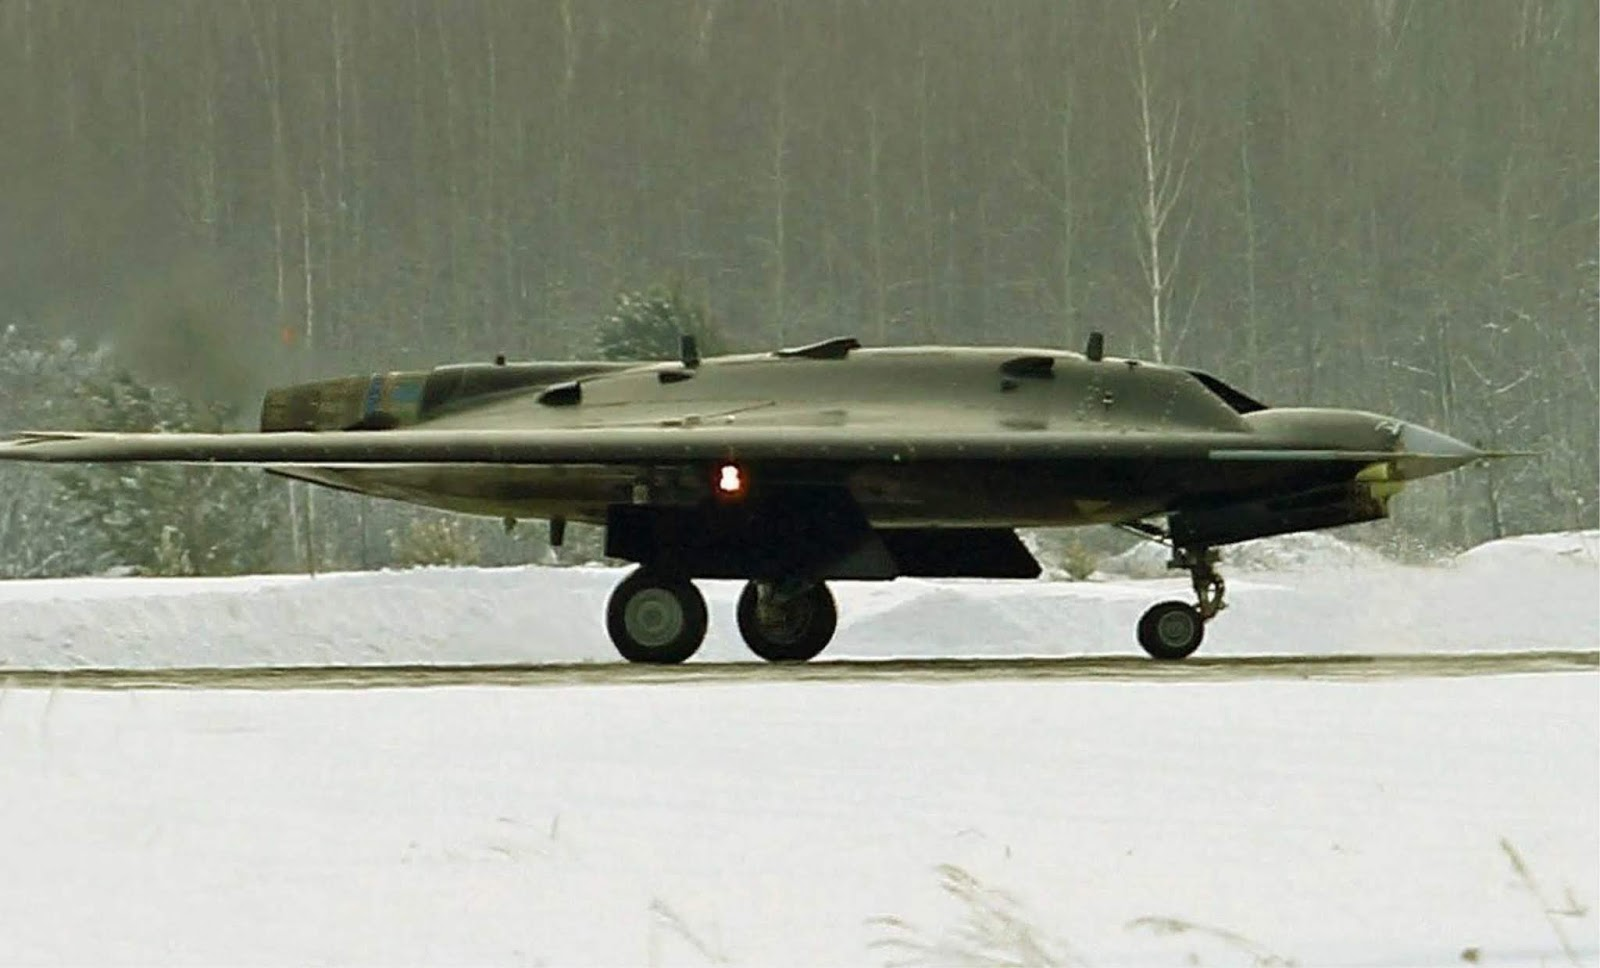 Drone serang Berat Hunter berkecepatan supersonik